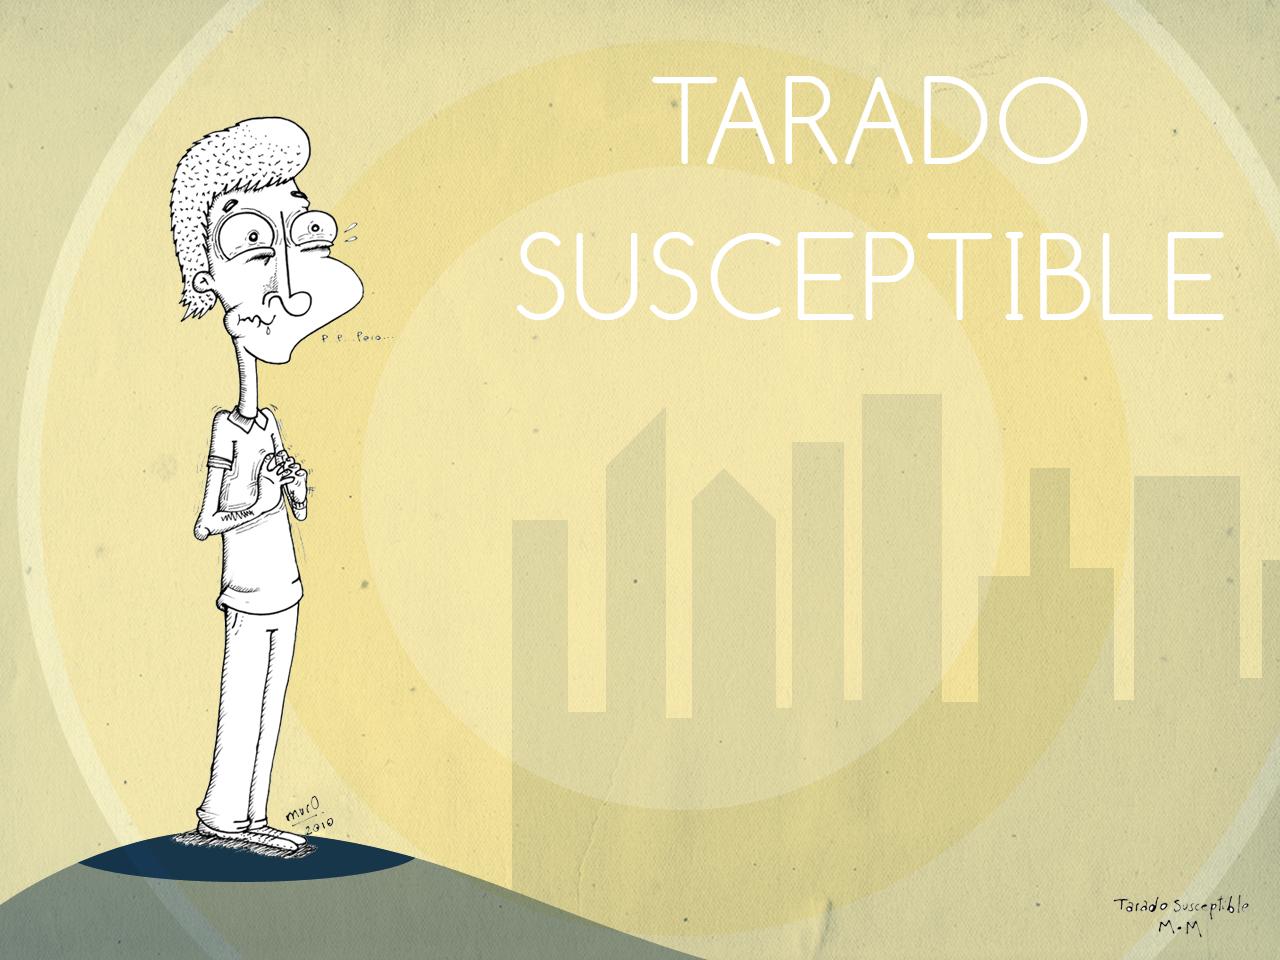 Lapicero: Tarado Susceptible - Wallpaper 01